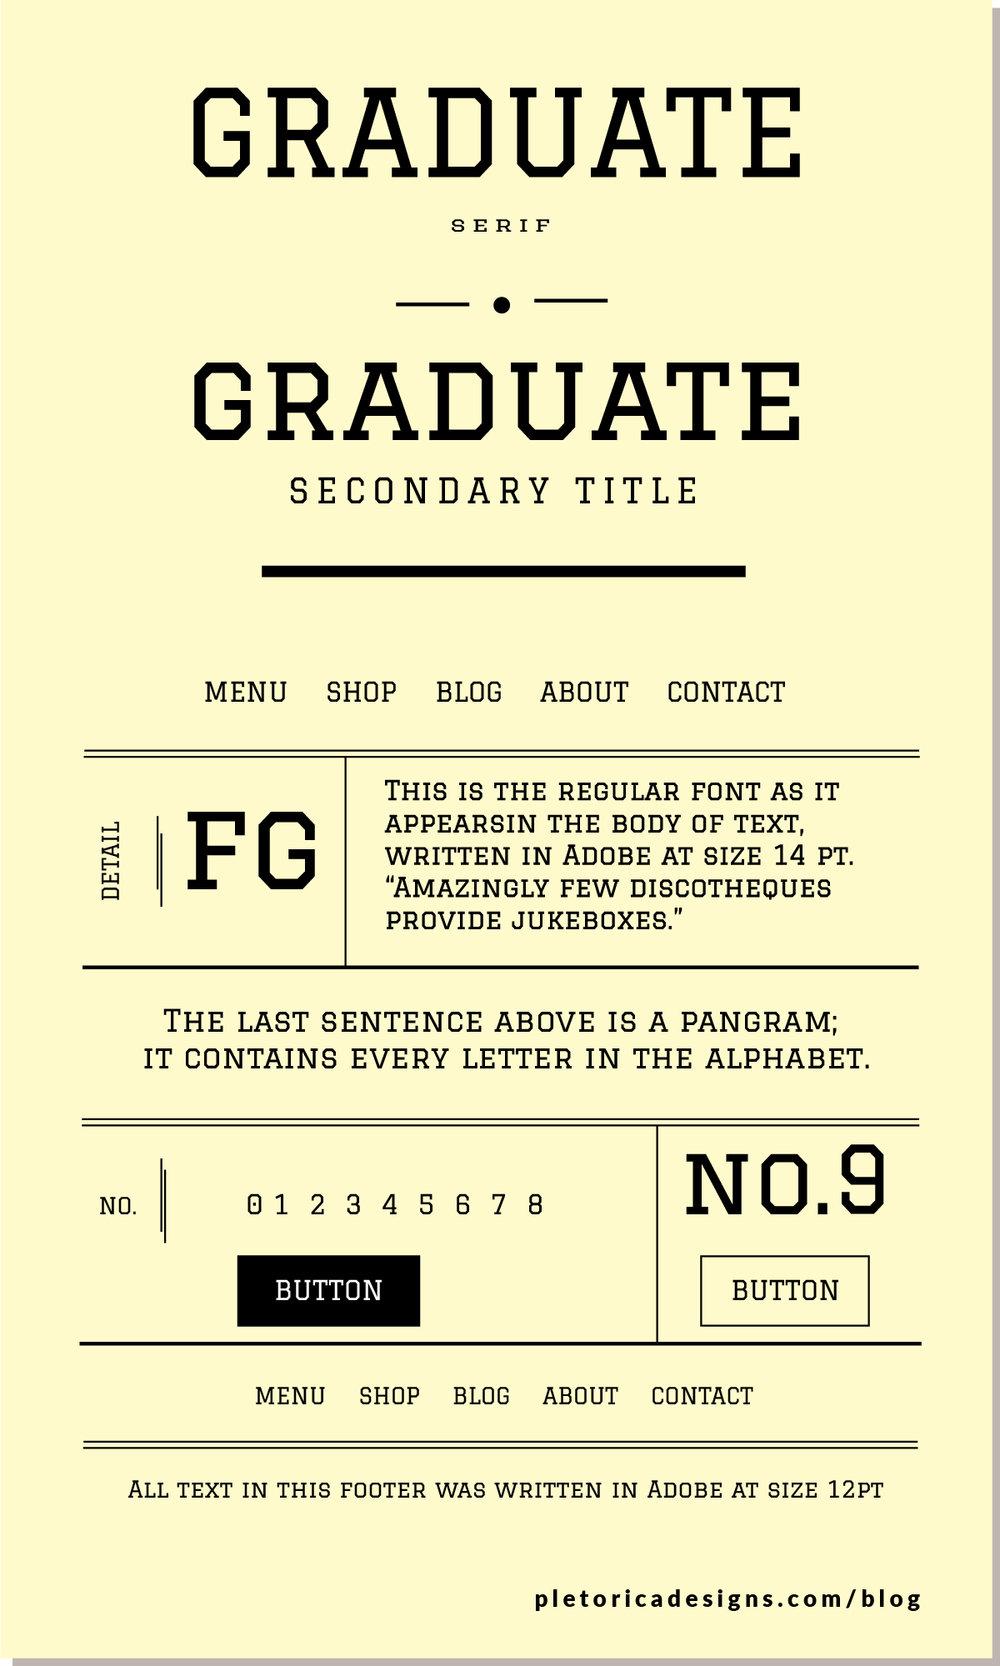 LET'S TYPE: Graduate — PLETÓRICA DESIGNS